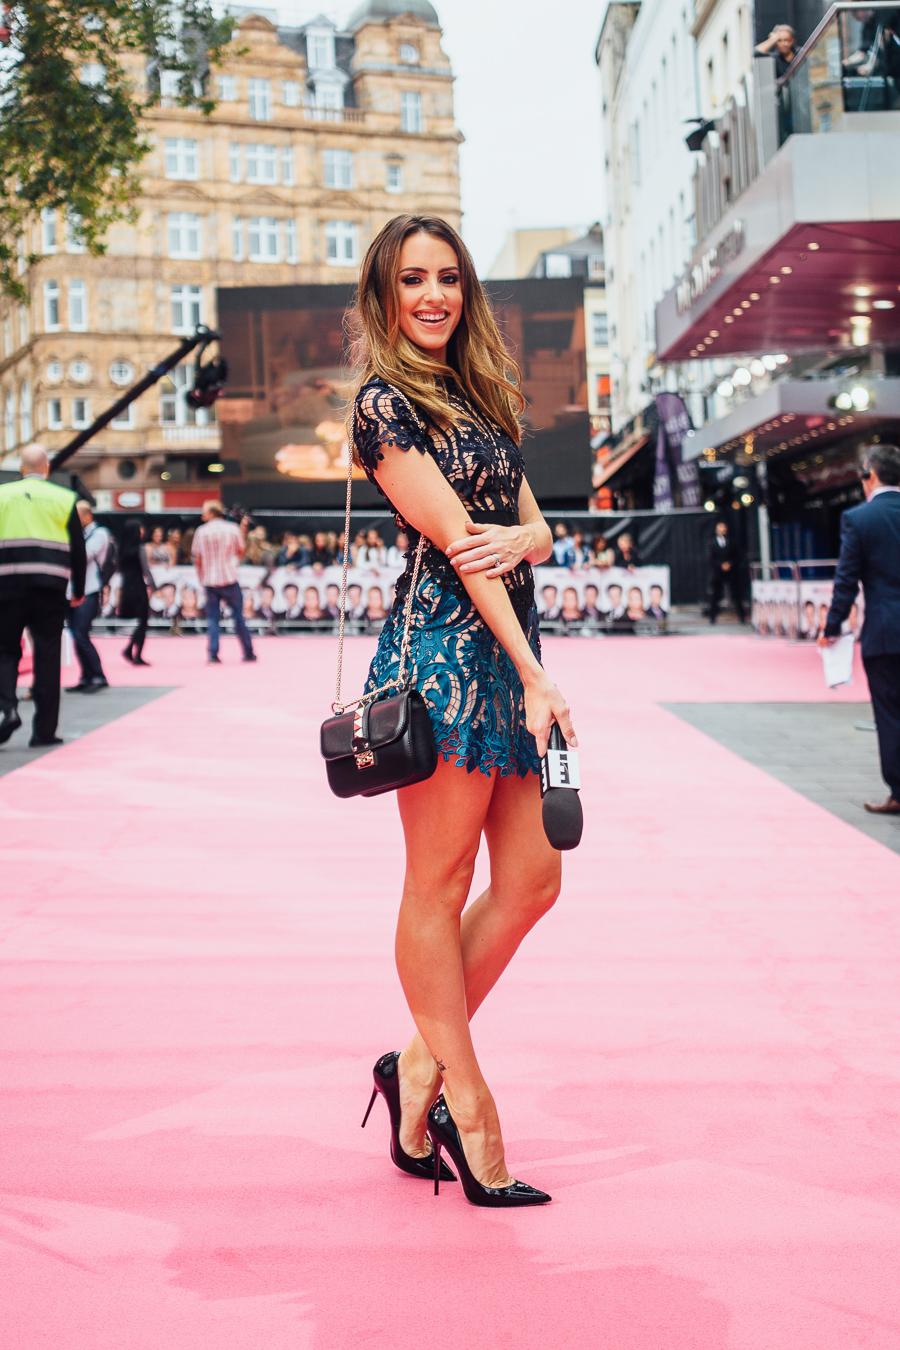 Sabrina Chakici E! UK Ireland - Bridget Jones Baby world premiere - clutch and carry on blog - E! Host UK & Ireland_-7